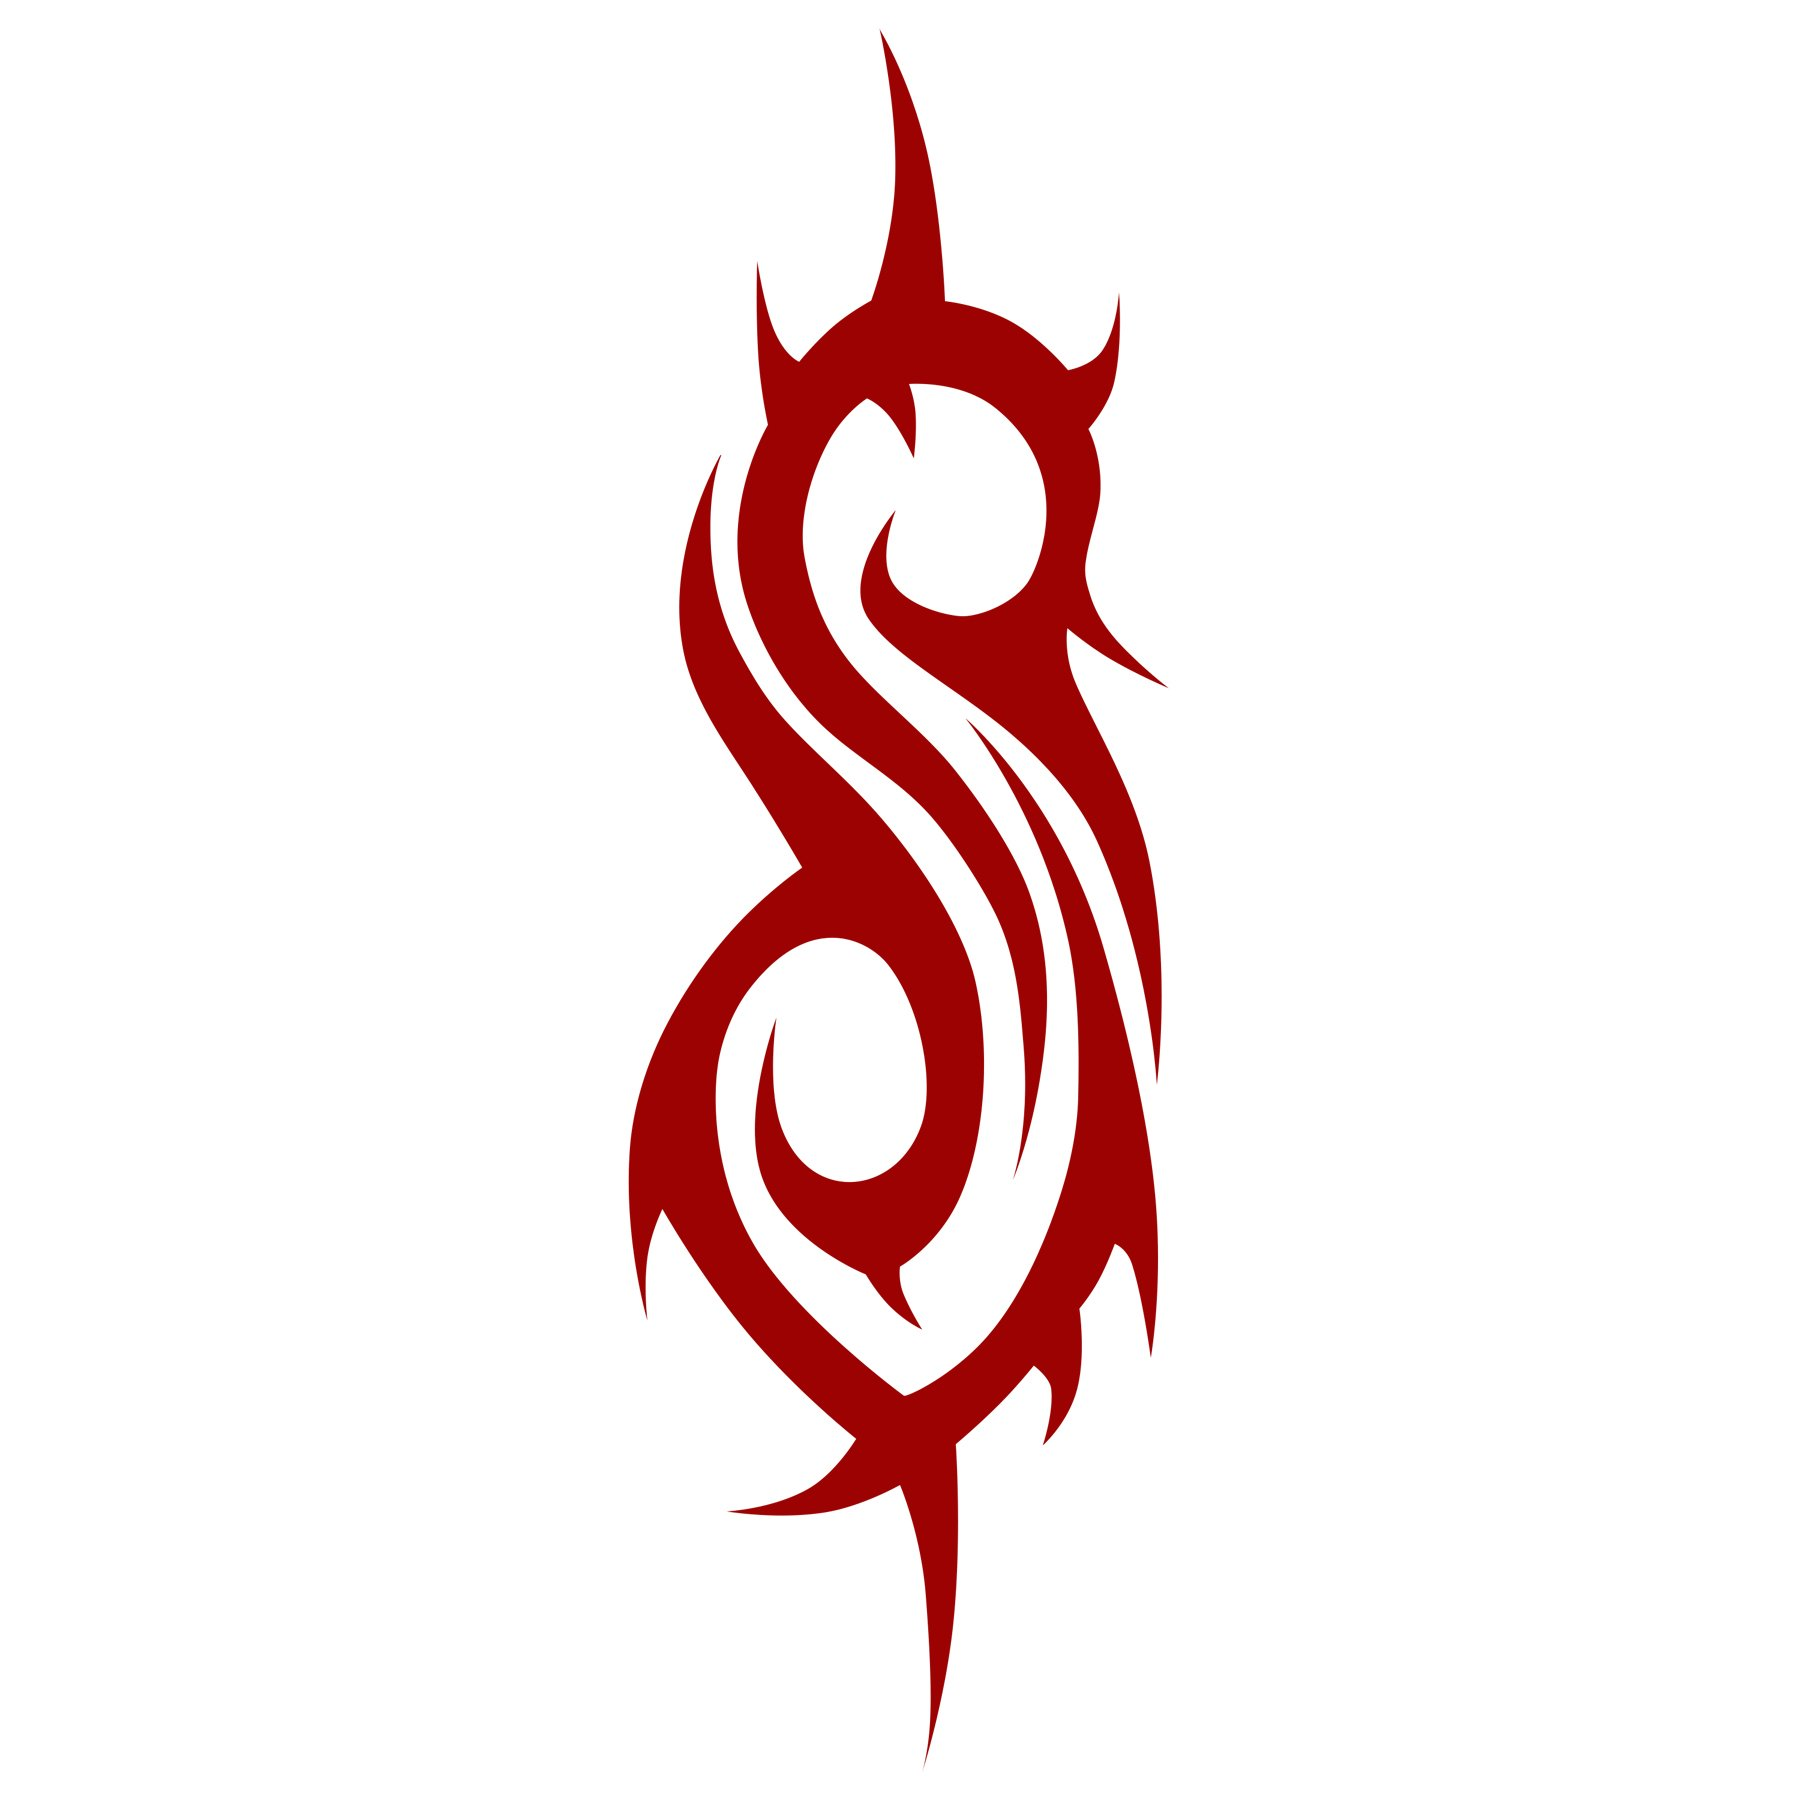 S Symbol Logo Meaning Slipkno...